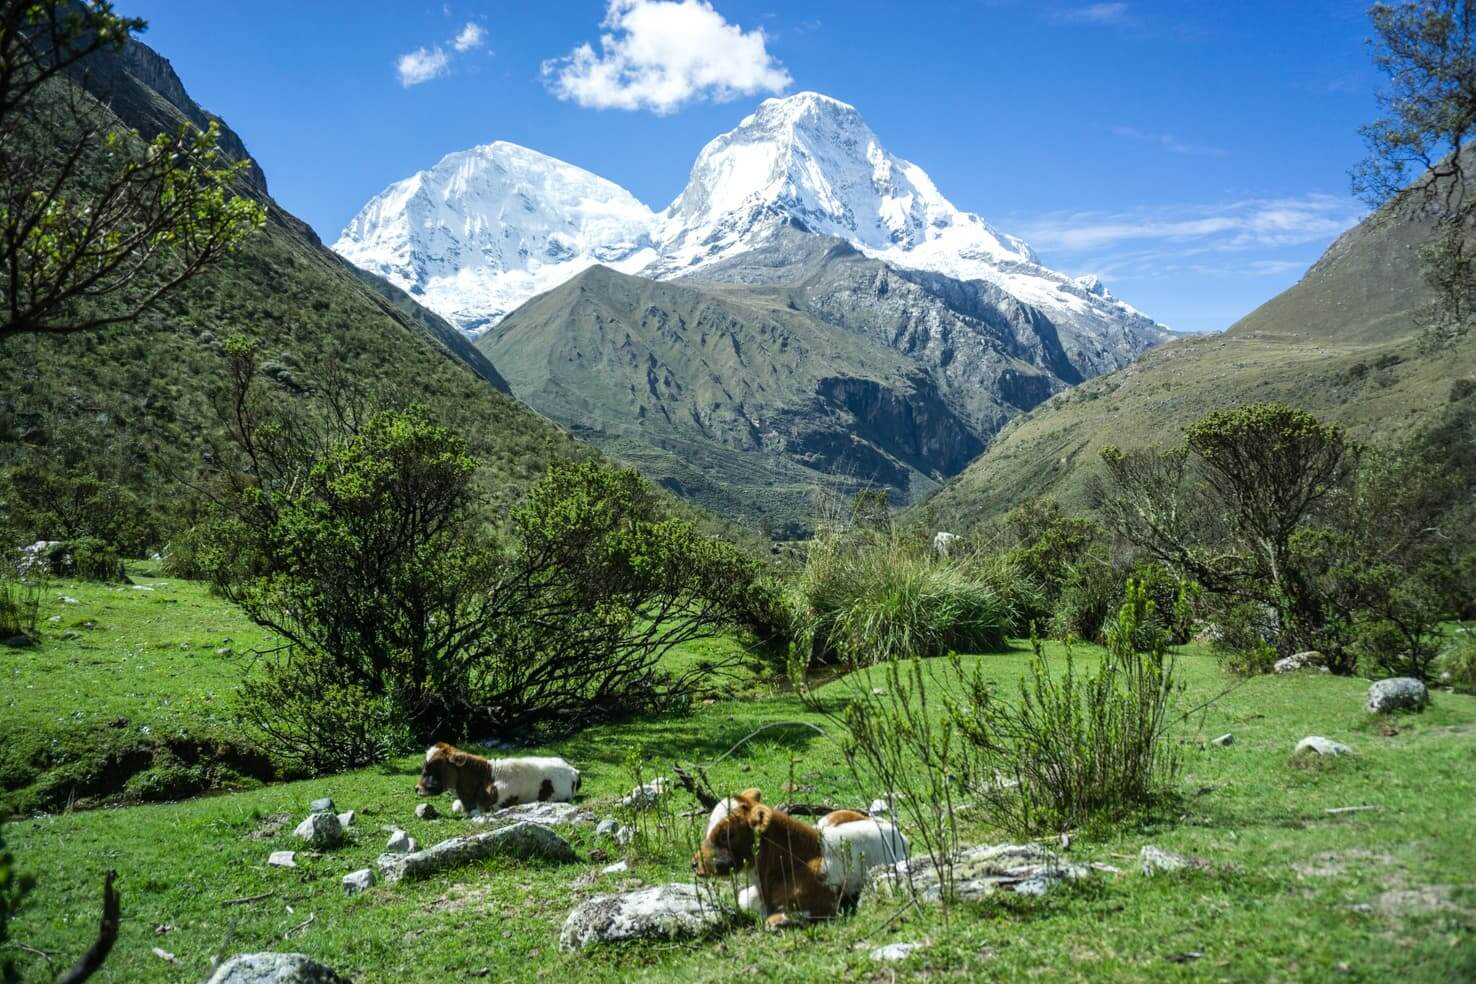 Huaraz, Peru - South American outdoor capital and gateway to Huascaran National Park